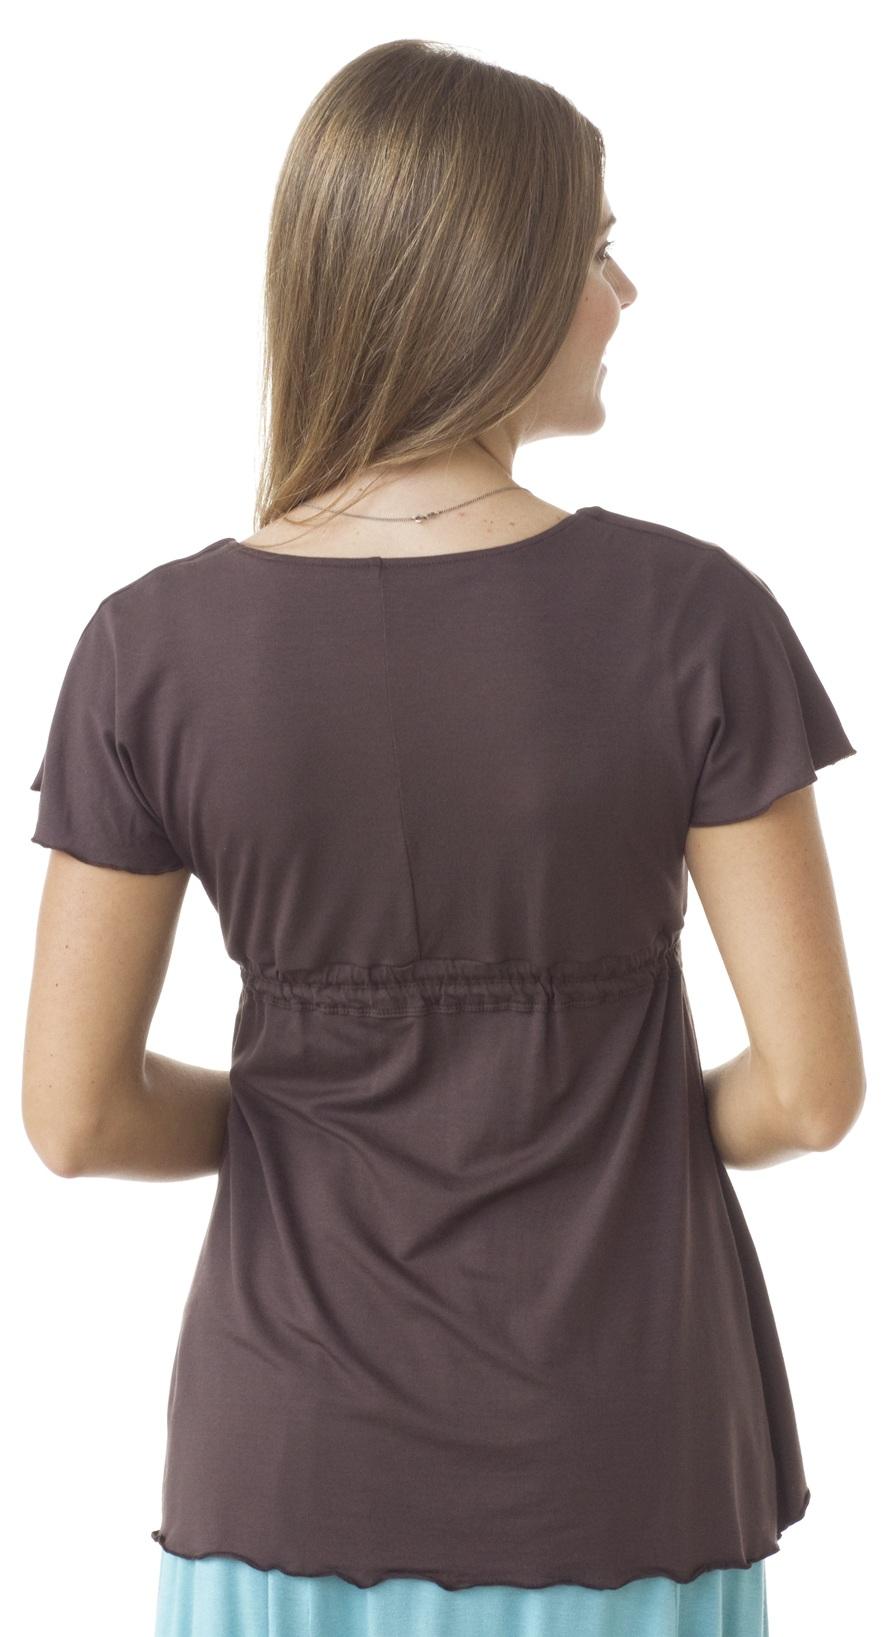 nixilu-corella-nursing-top-brown-back.jpg